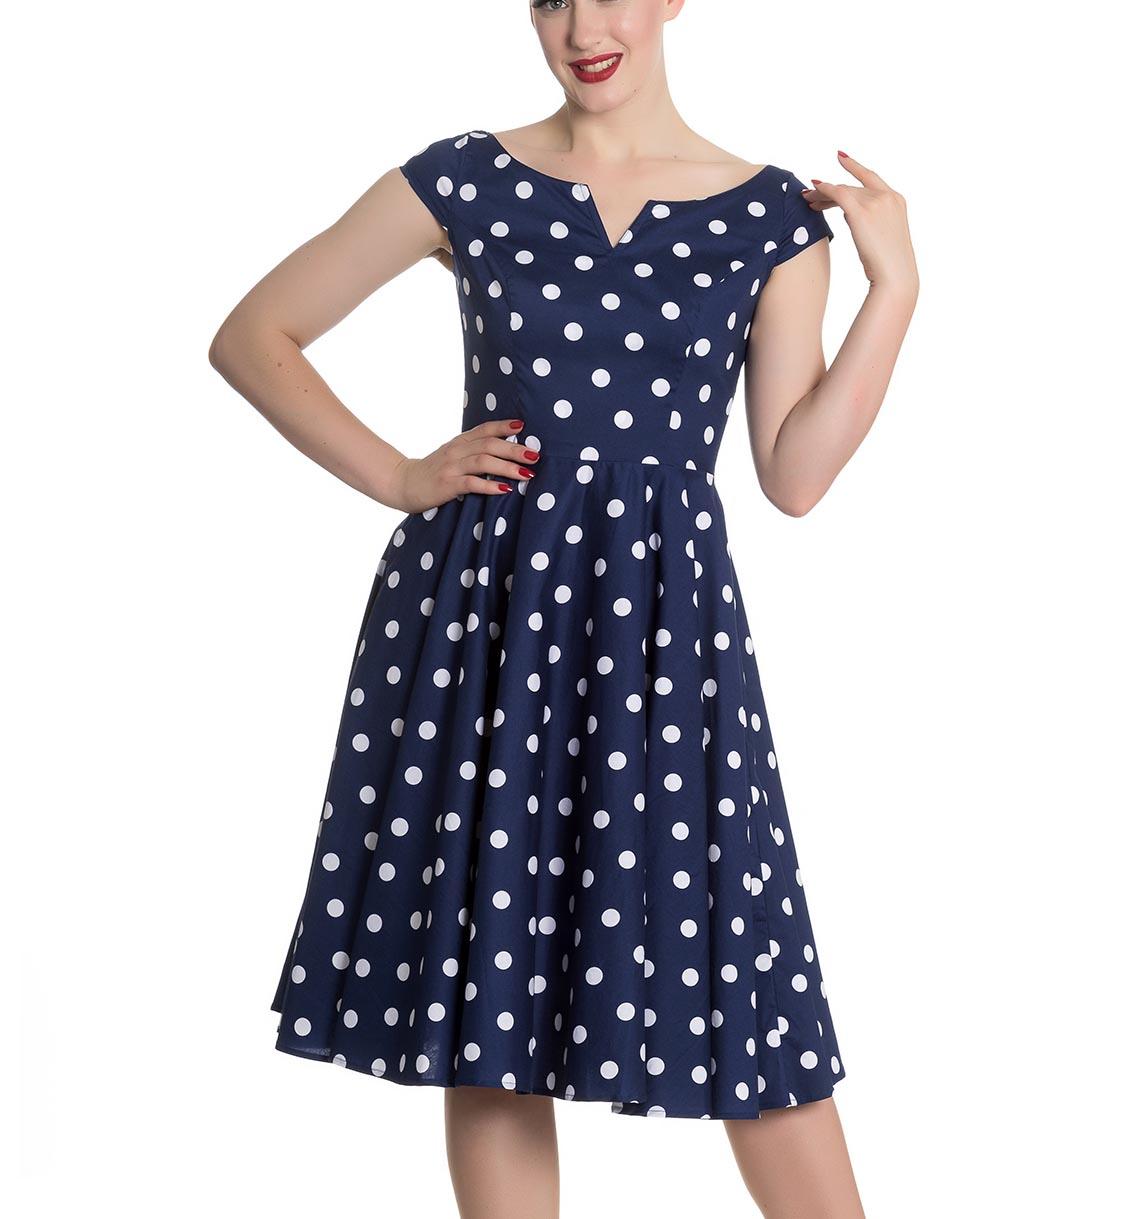 Hell-Bunny-50s-Dress-Polka-Dot-NICKY-Pin-Up-Rockabilly-Navy-Blue-All-Sizes thumbnail 11